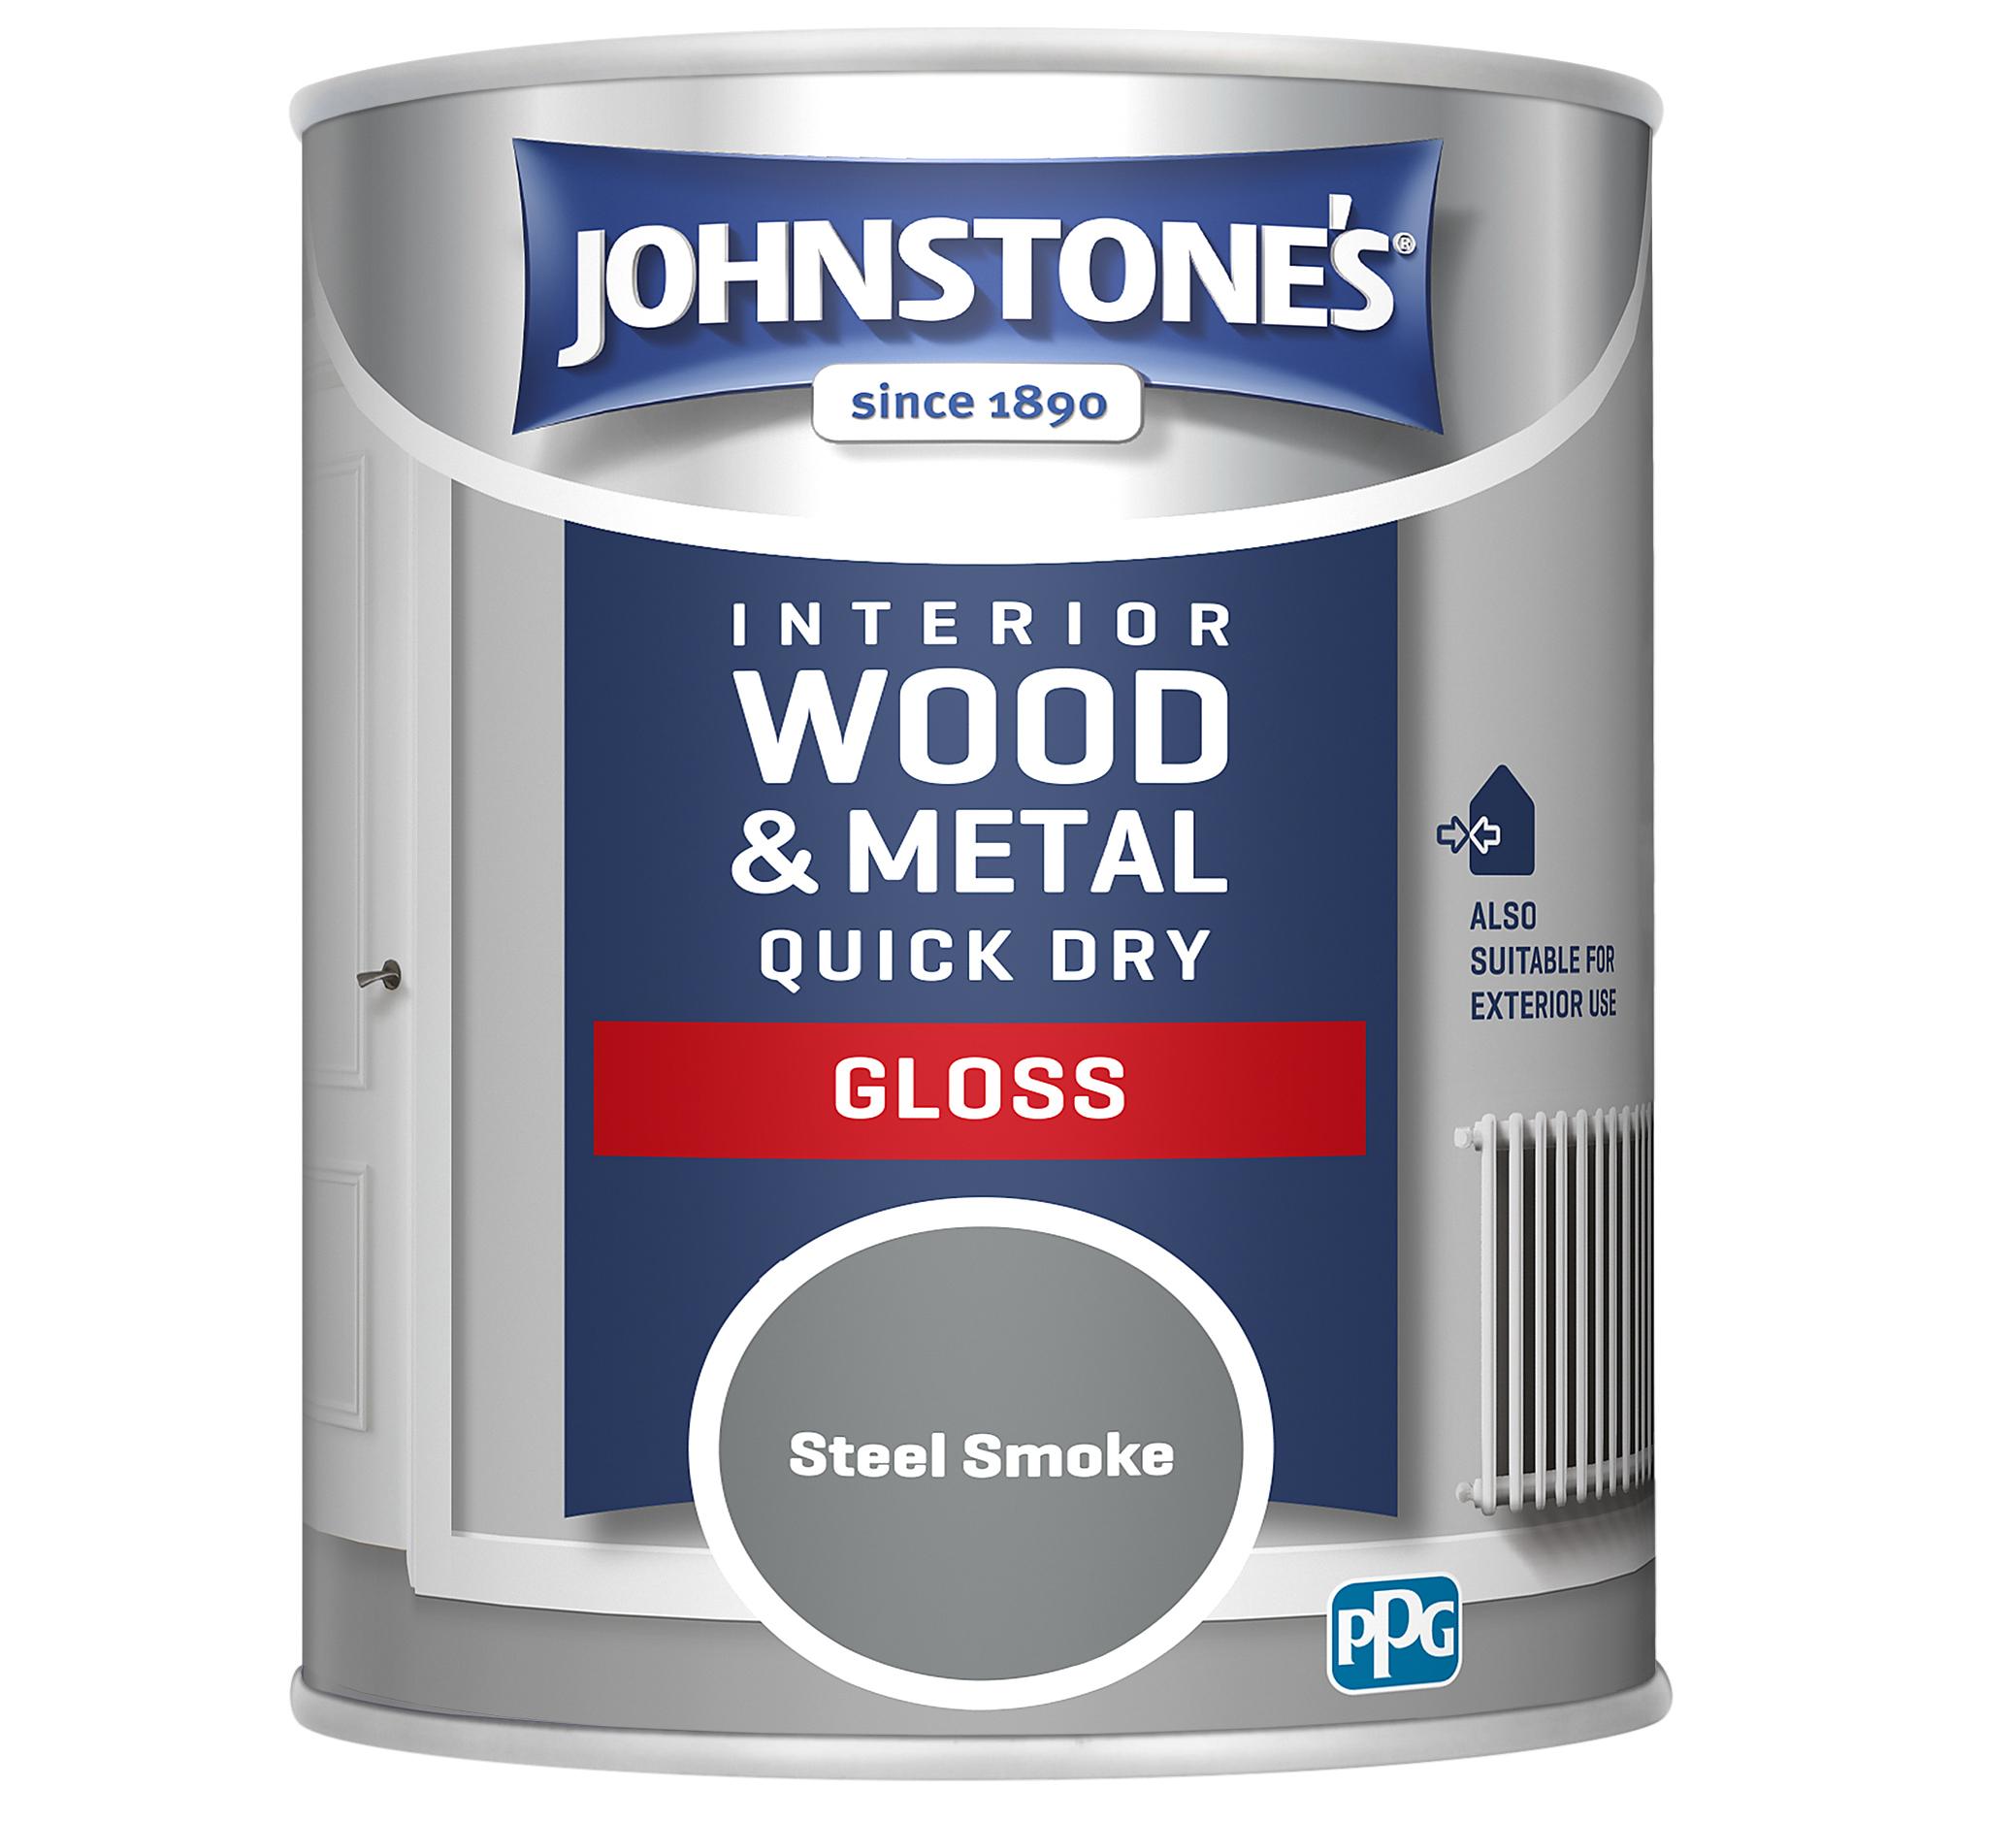 Johnstones 750ml Quick Dry Gloss Paint - Steel Smoke